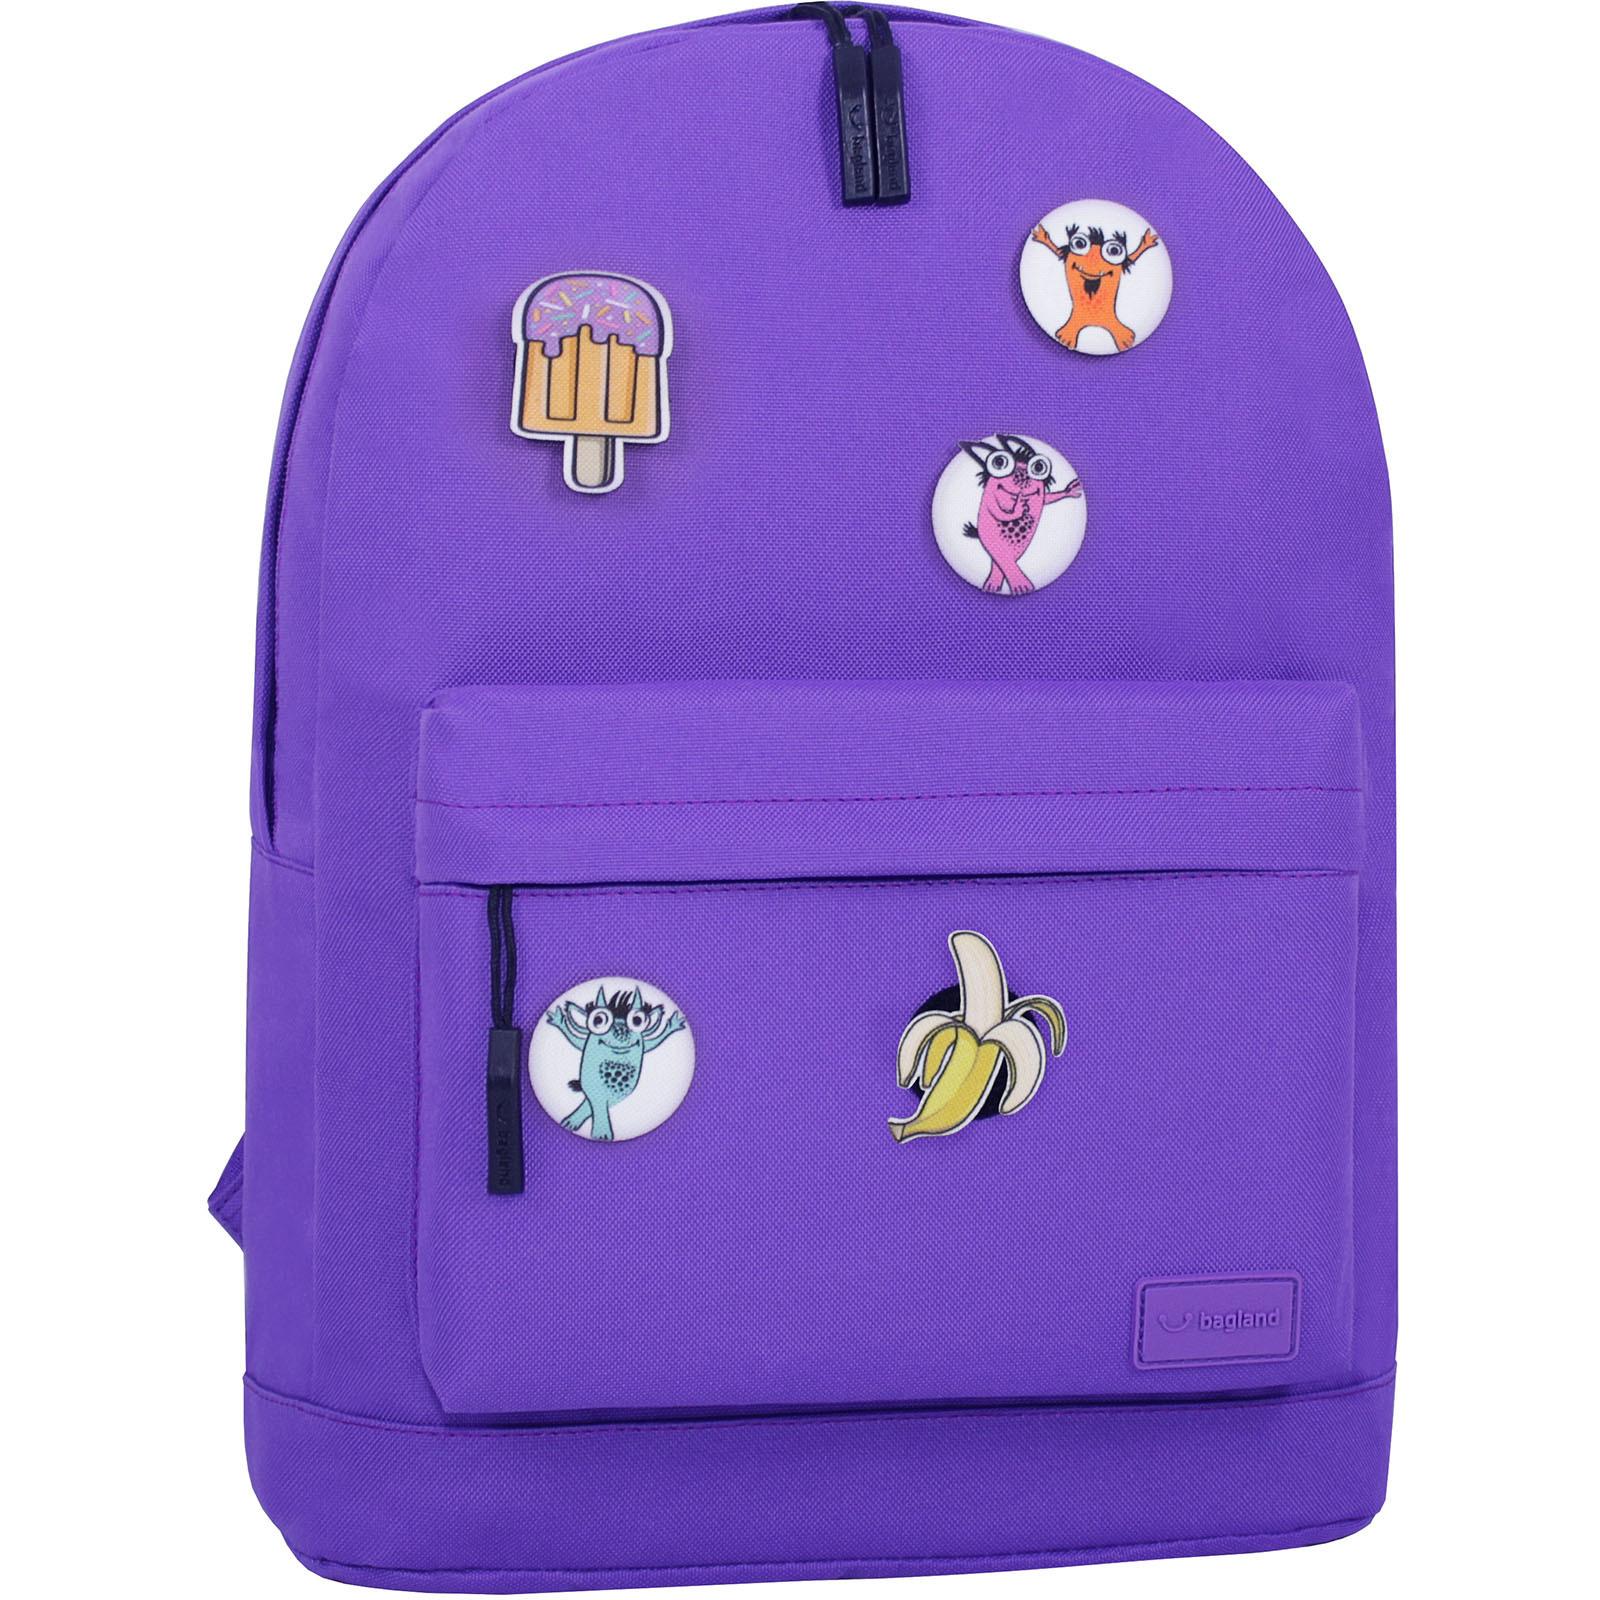 Молодежные рюкзаки Рюкзак Bagland Молодежный W/R 17 л. 339 Фиолетовый (00533662 Ш) IMG_2885.JPG